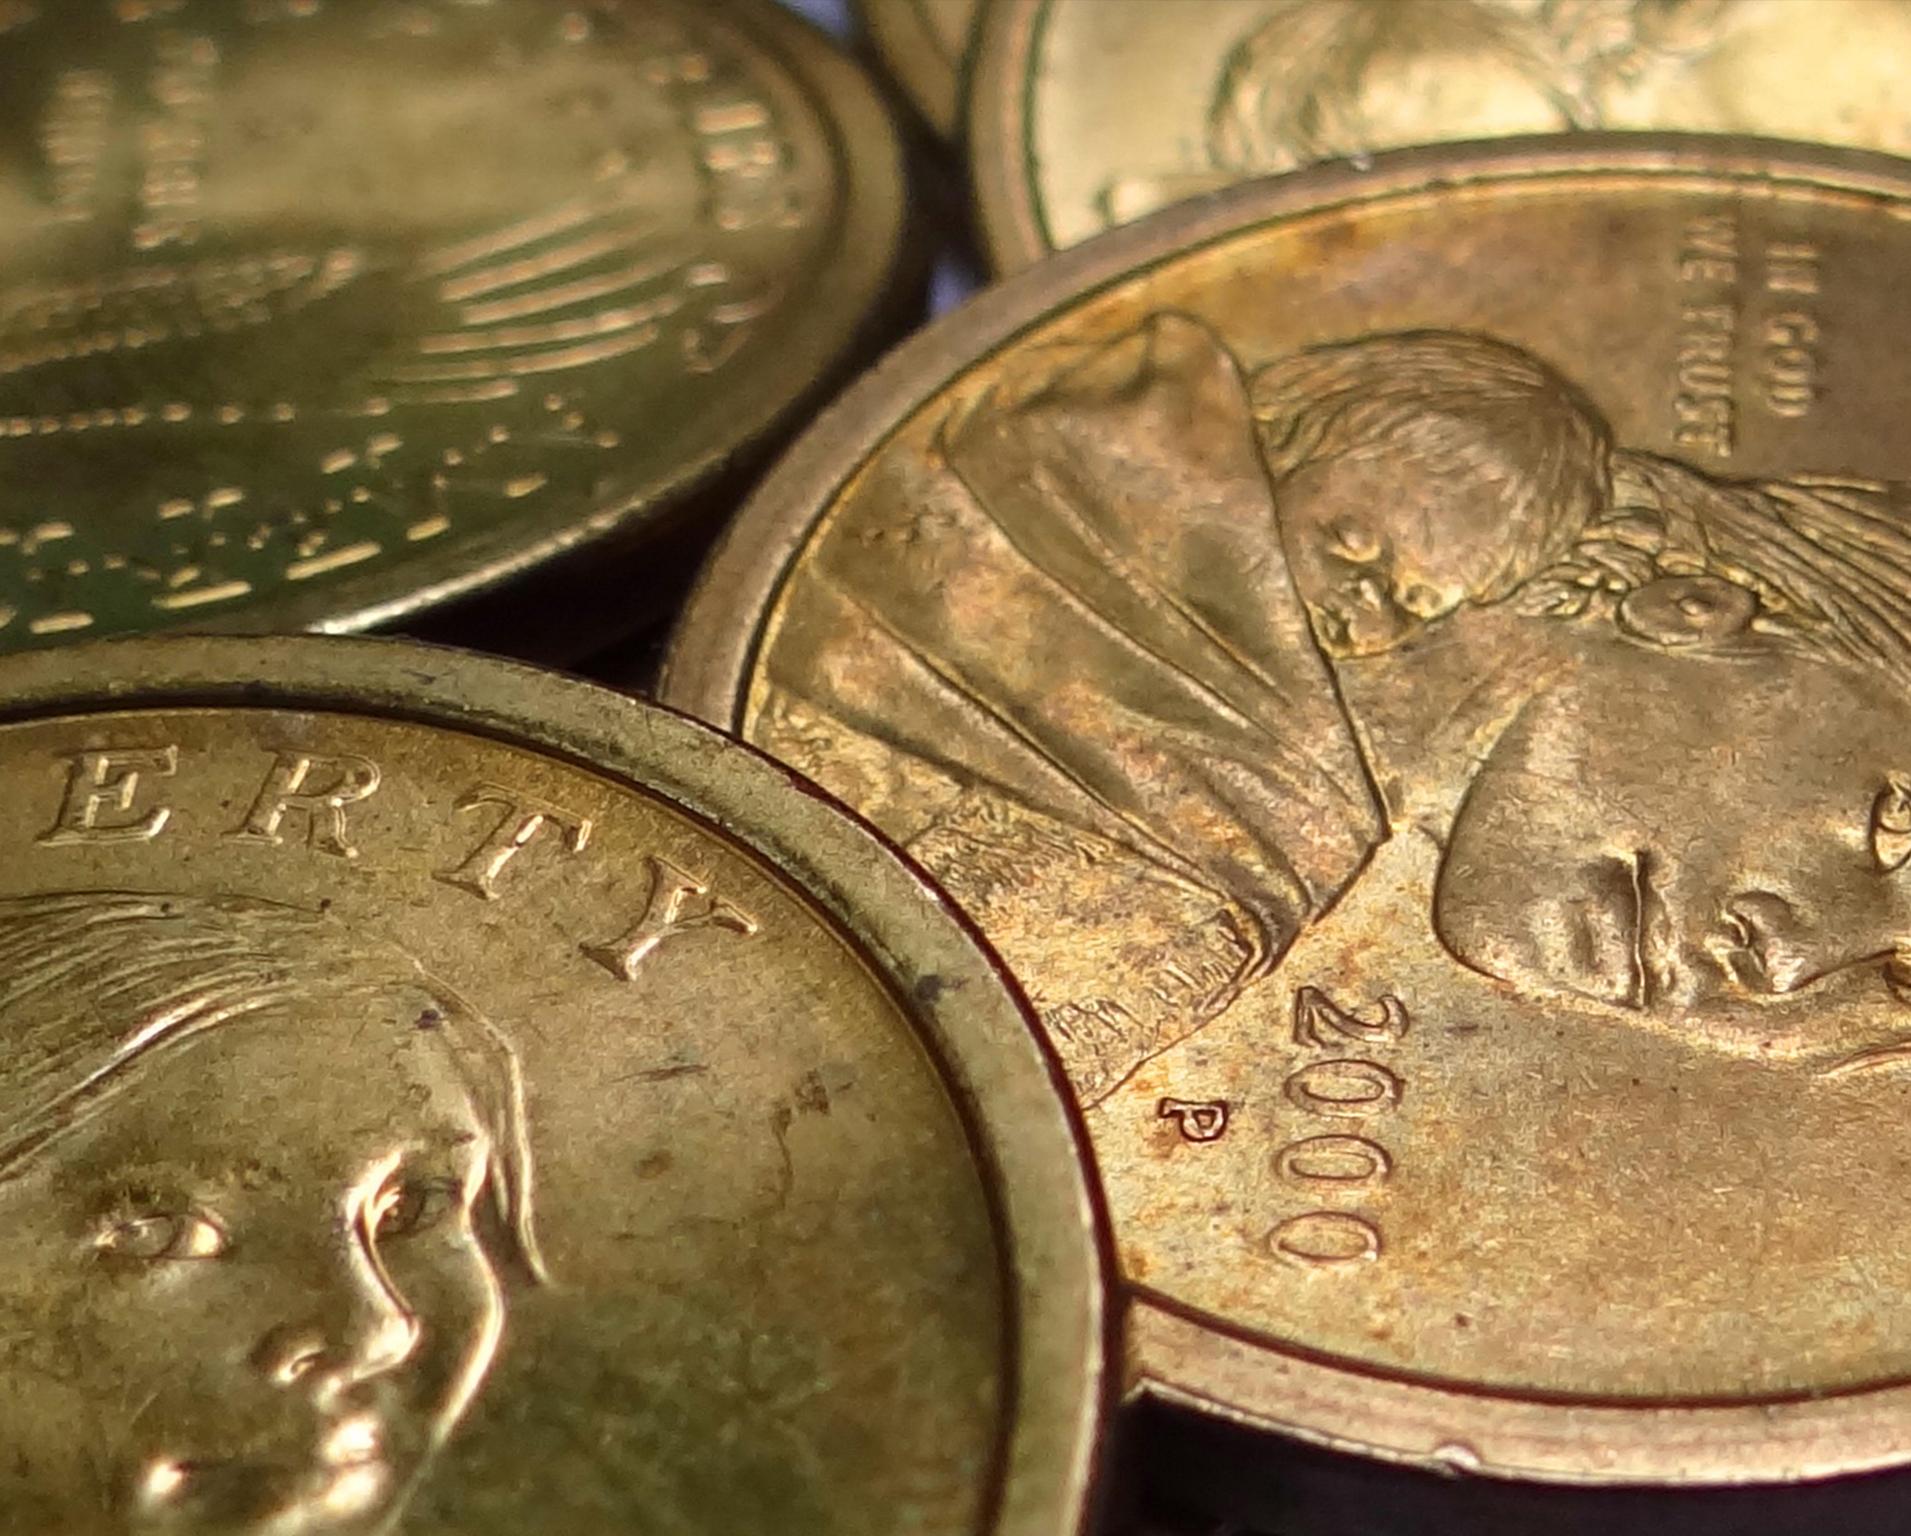 Estate & Gift Tax Returns